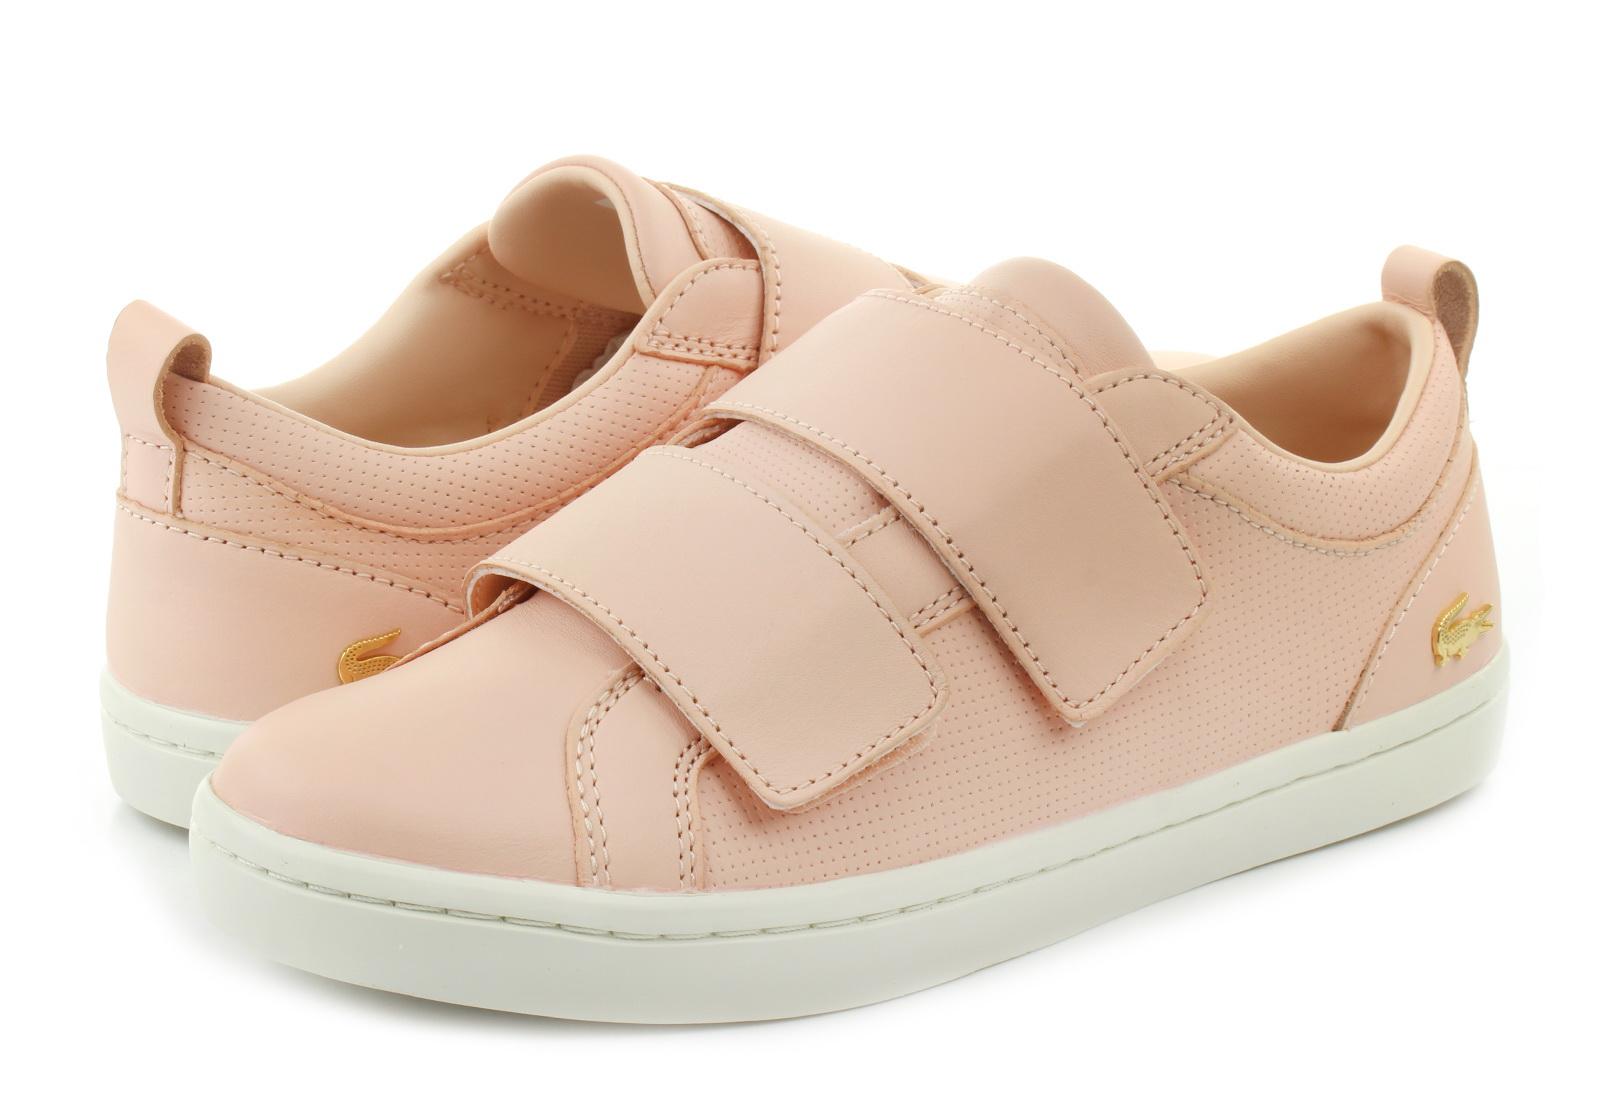 Lacoste Cipő - Straightset Strap - 191CFA0048-TS2 - Office Shoes ... 06ffd8451c